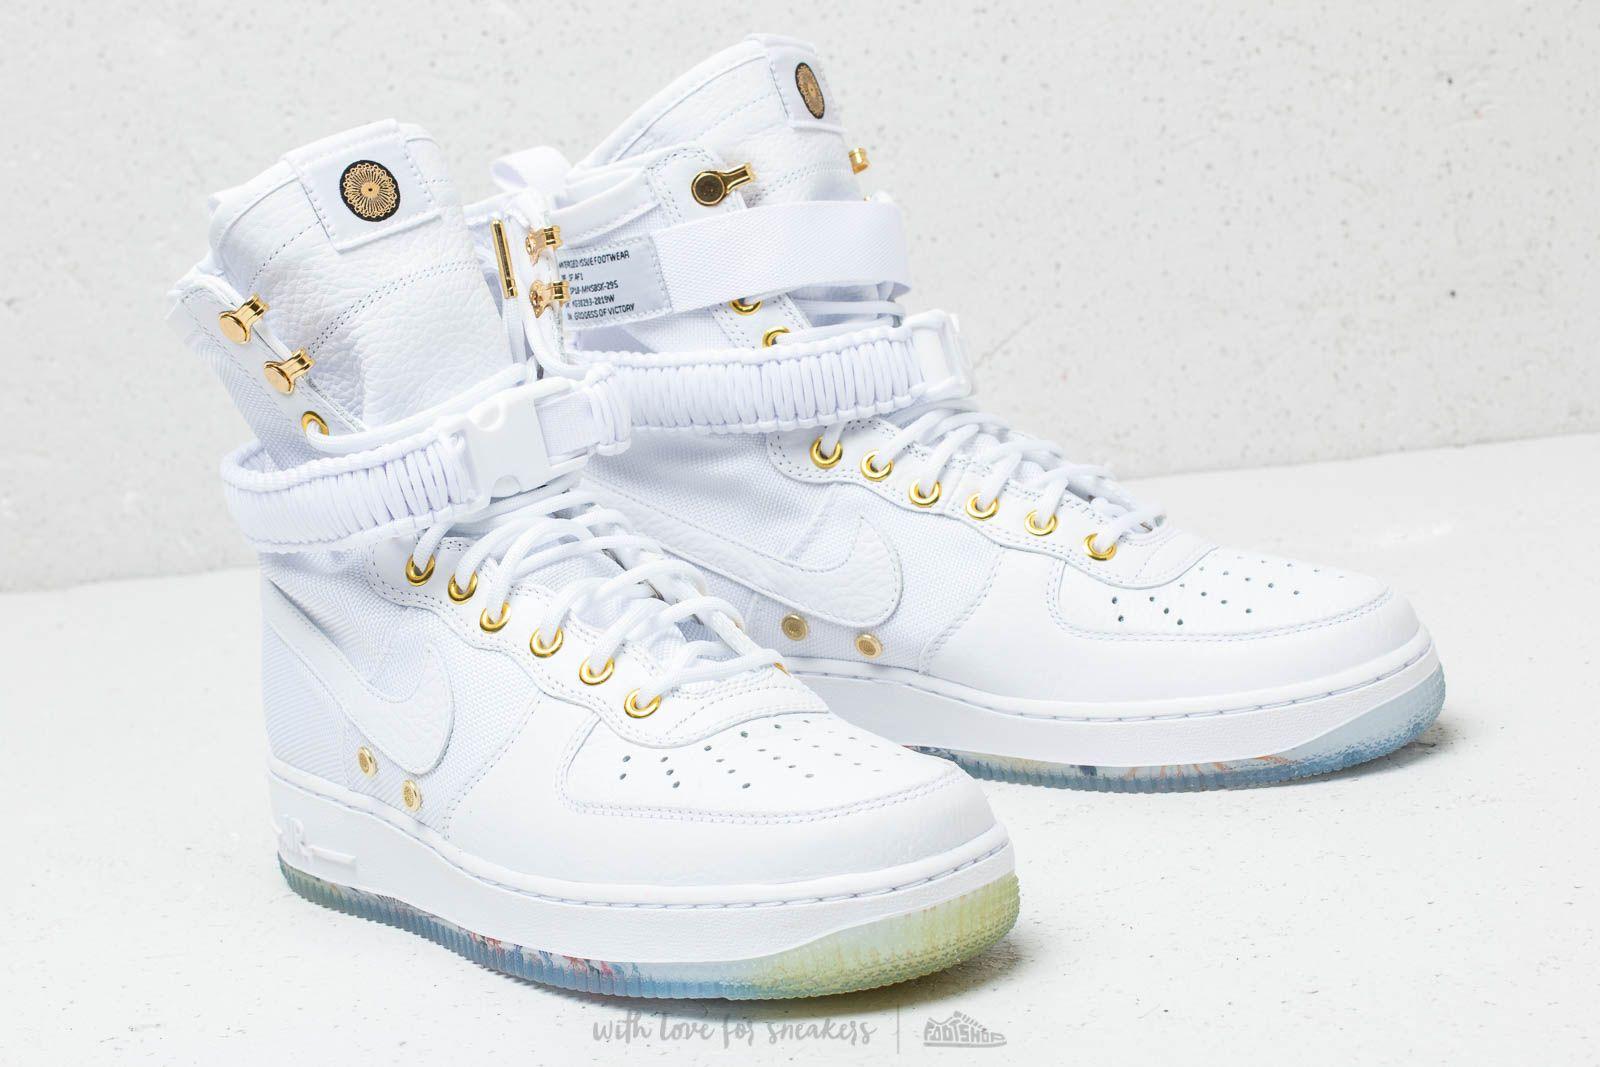 Nike GoldFootshop White Force Lny Qs Metallic Sf Air 1 Pn08wyvOmN